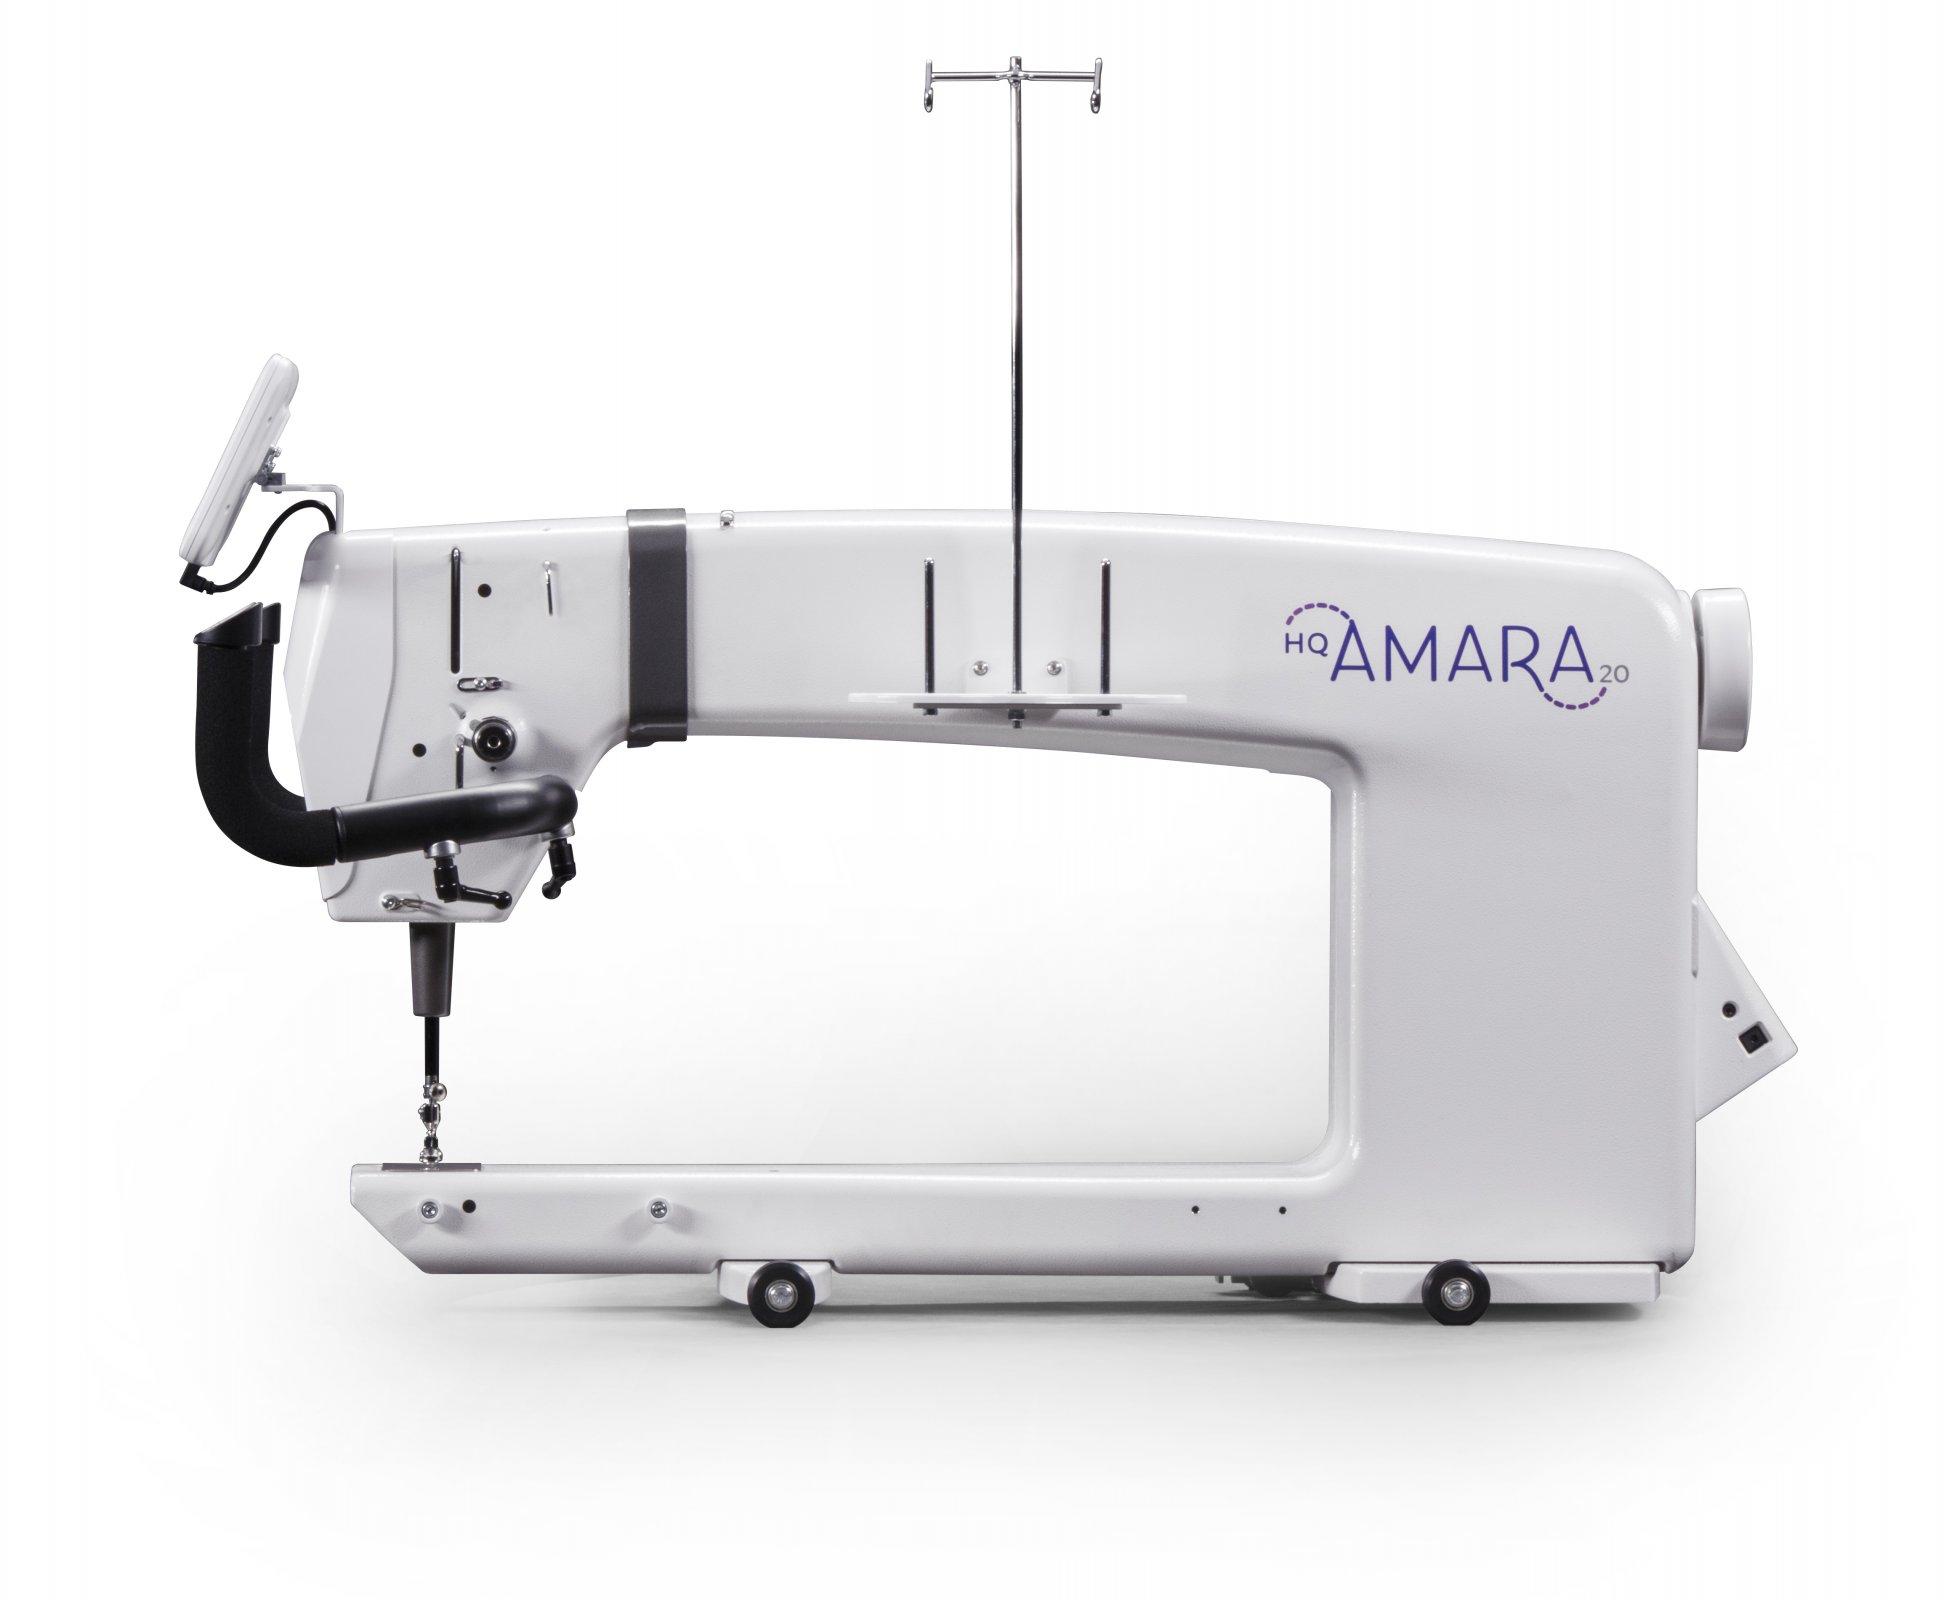 HQ- Amara 20 with ProStitcher & 12' Frame